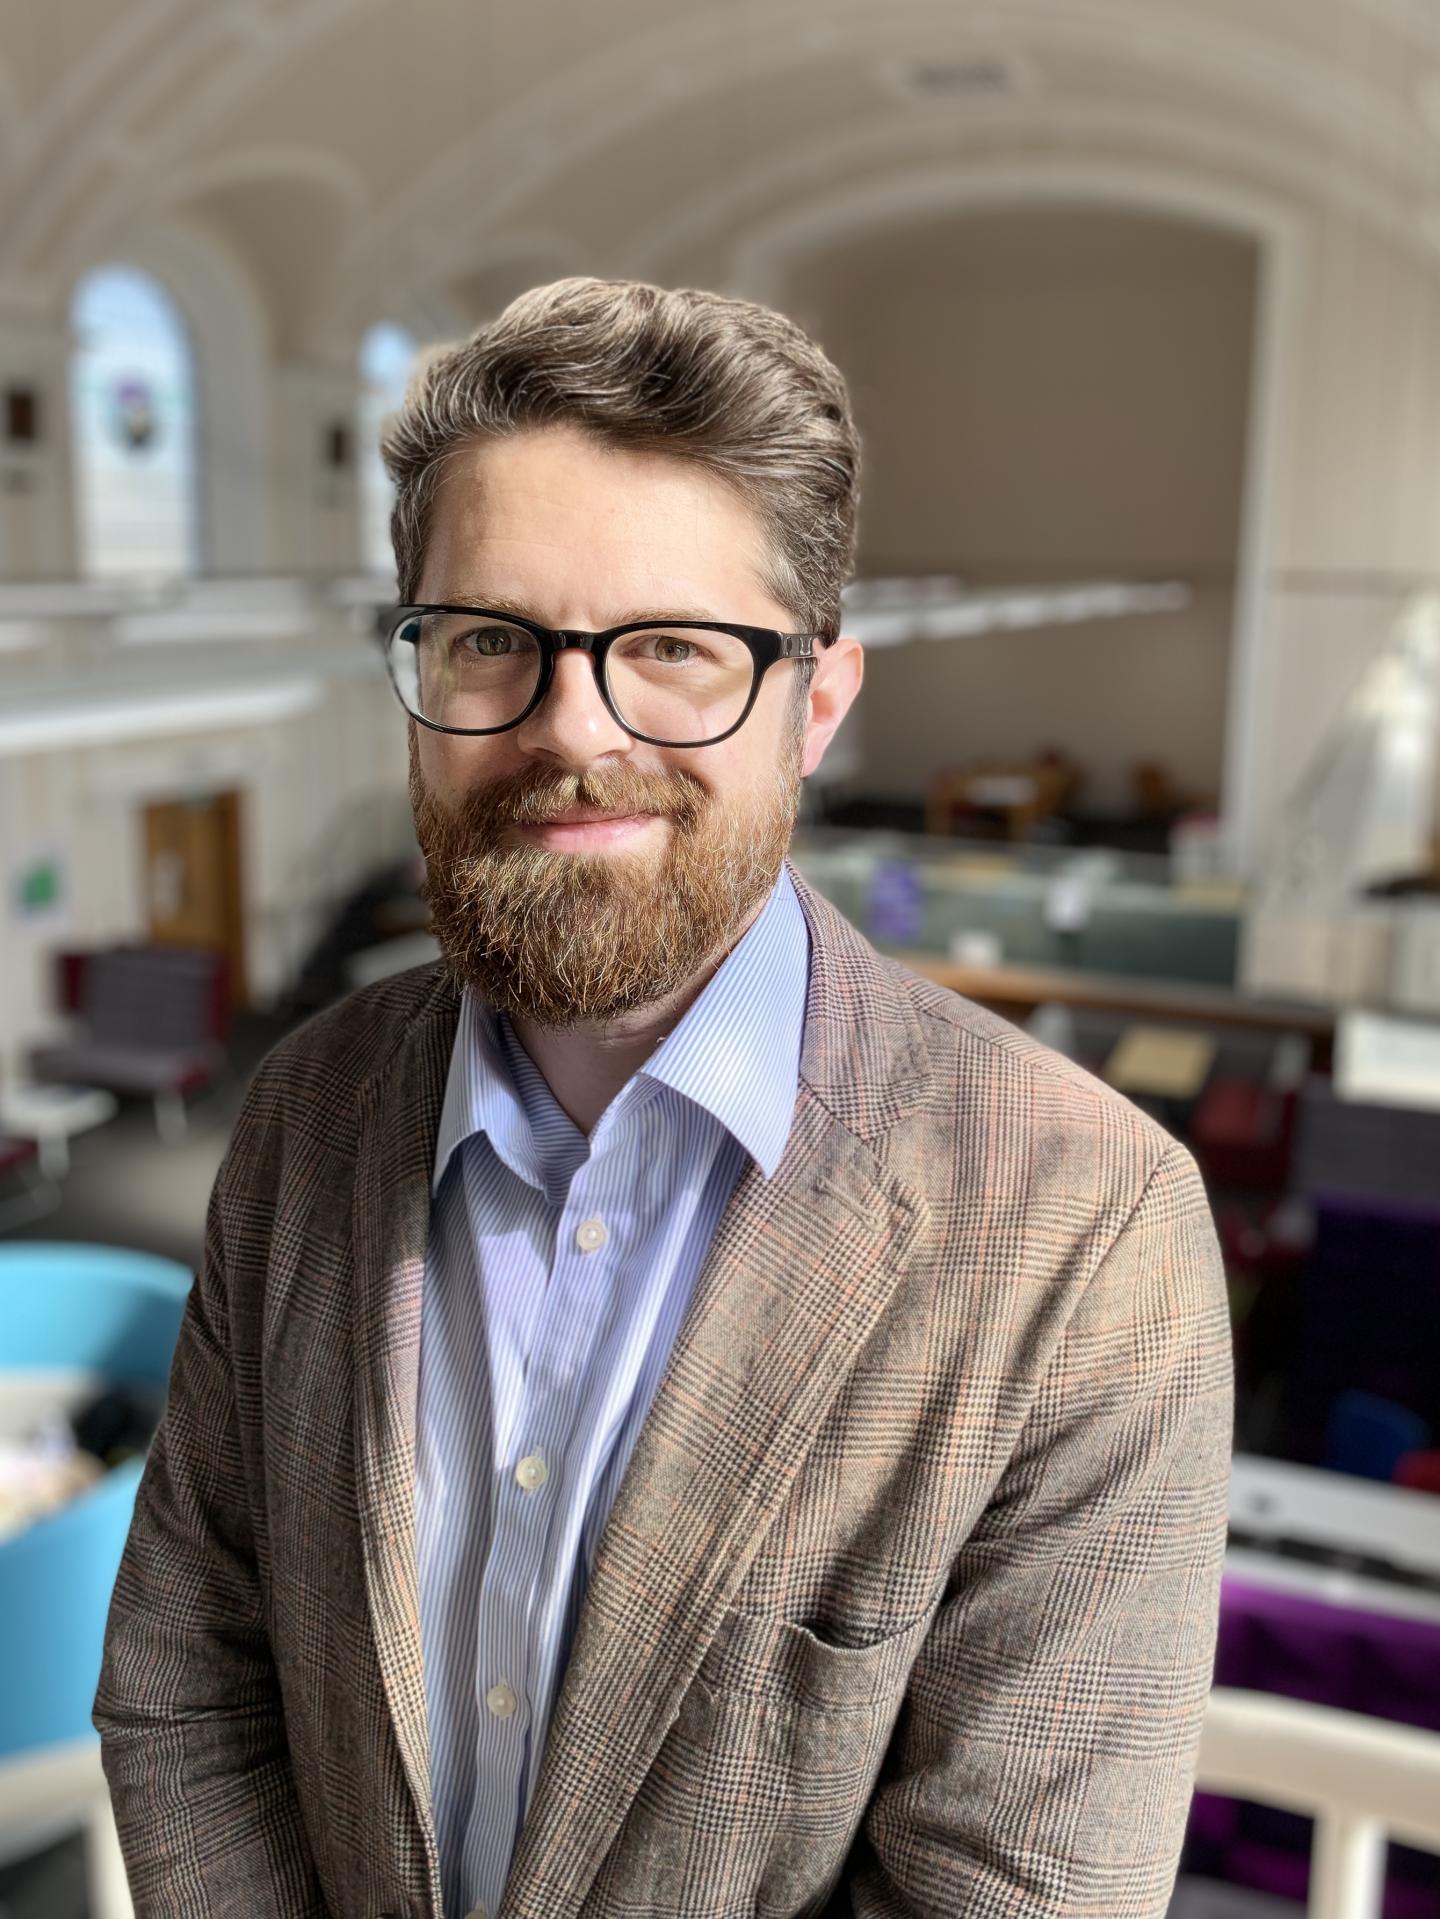 Ben Vincent, University of Dundee